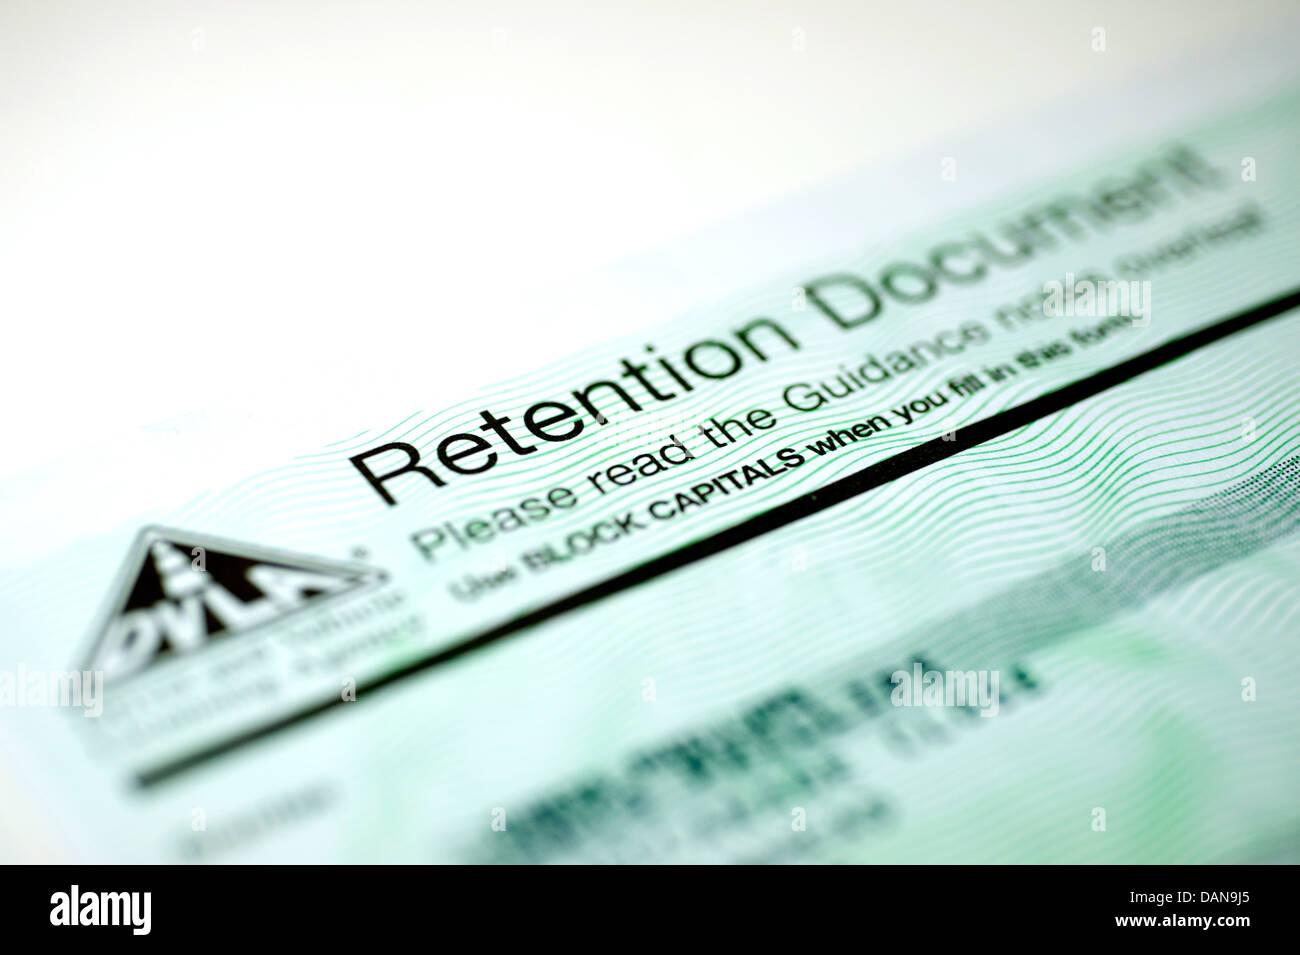 DVLA Cherished Transfer Retention Document - Stock Image